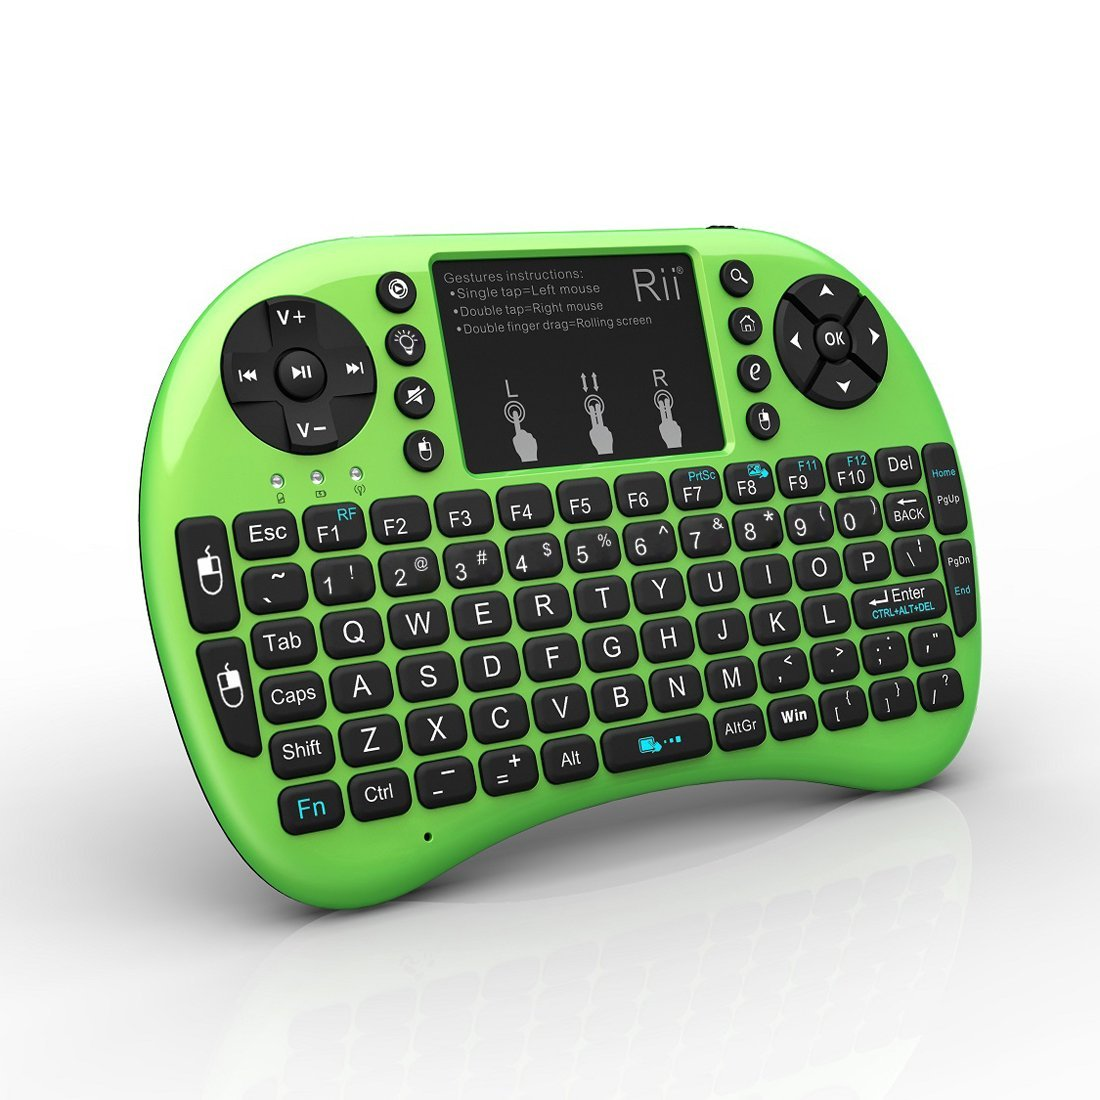 d8832f63190 mini keyboard Rii Mini i8+ 2.4G Wireless Keyboard with Touchpad for PC Pad  Google Andriod TV Box Red | Walmart Canada